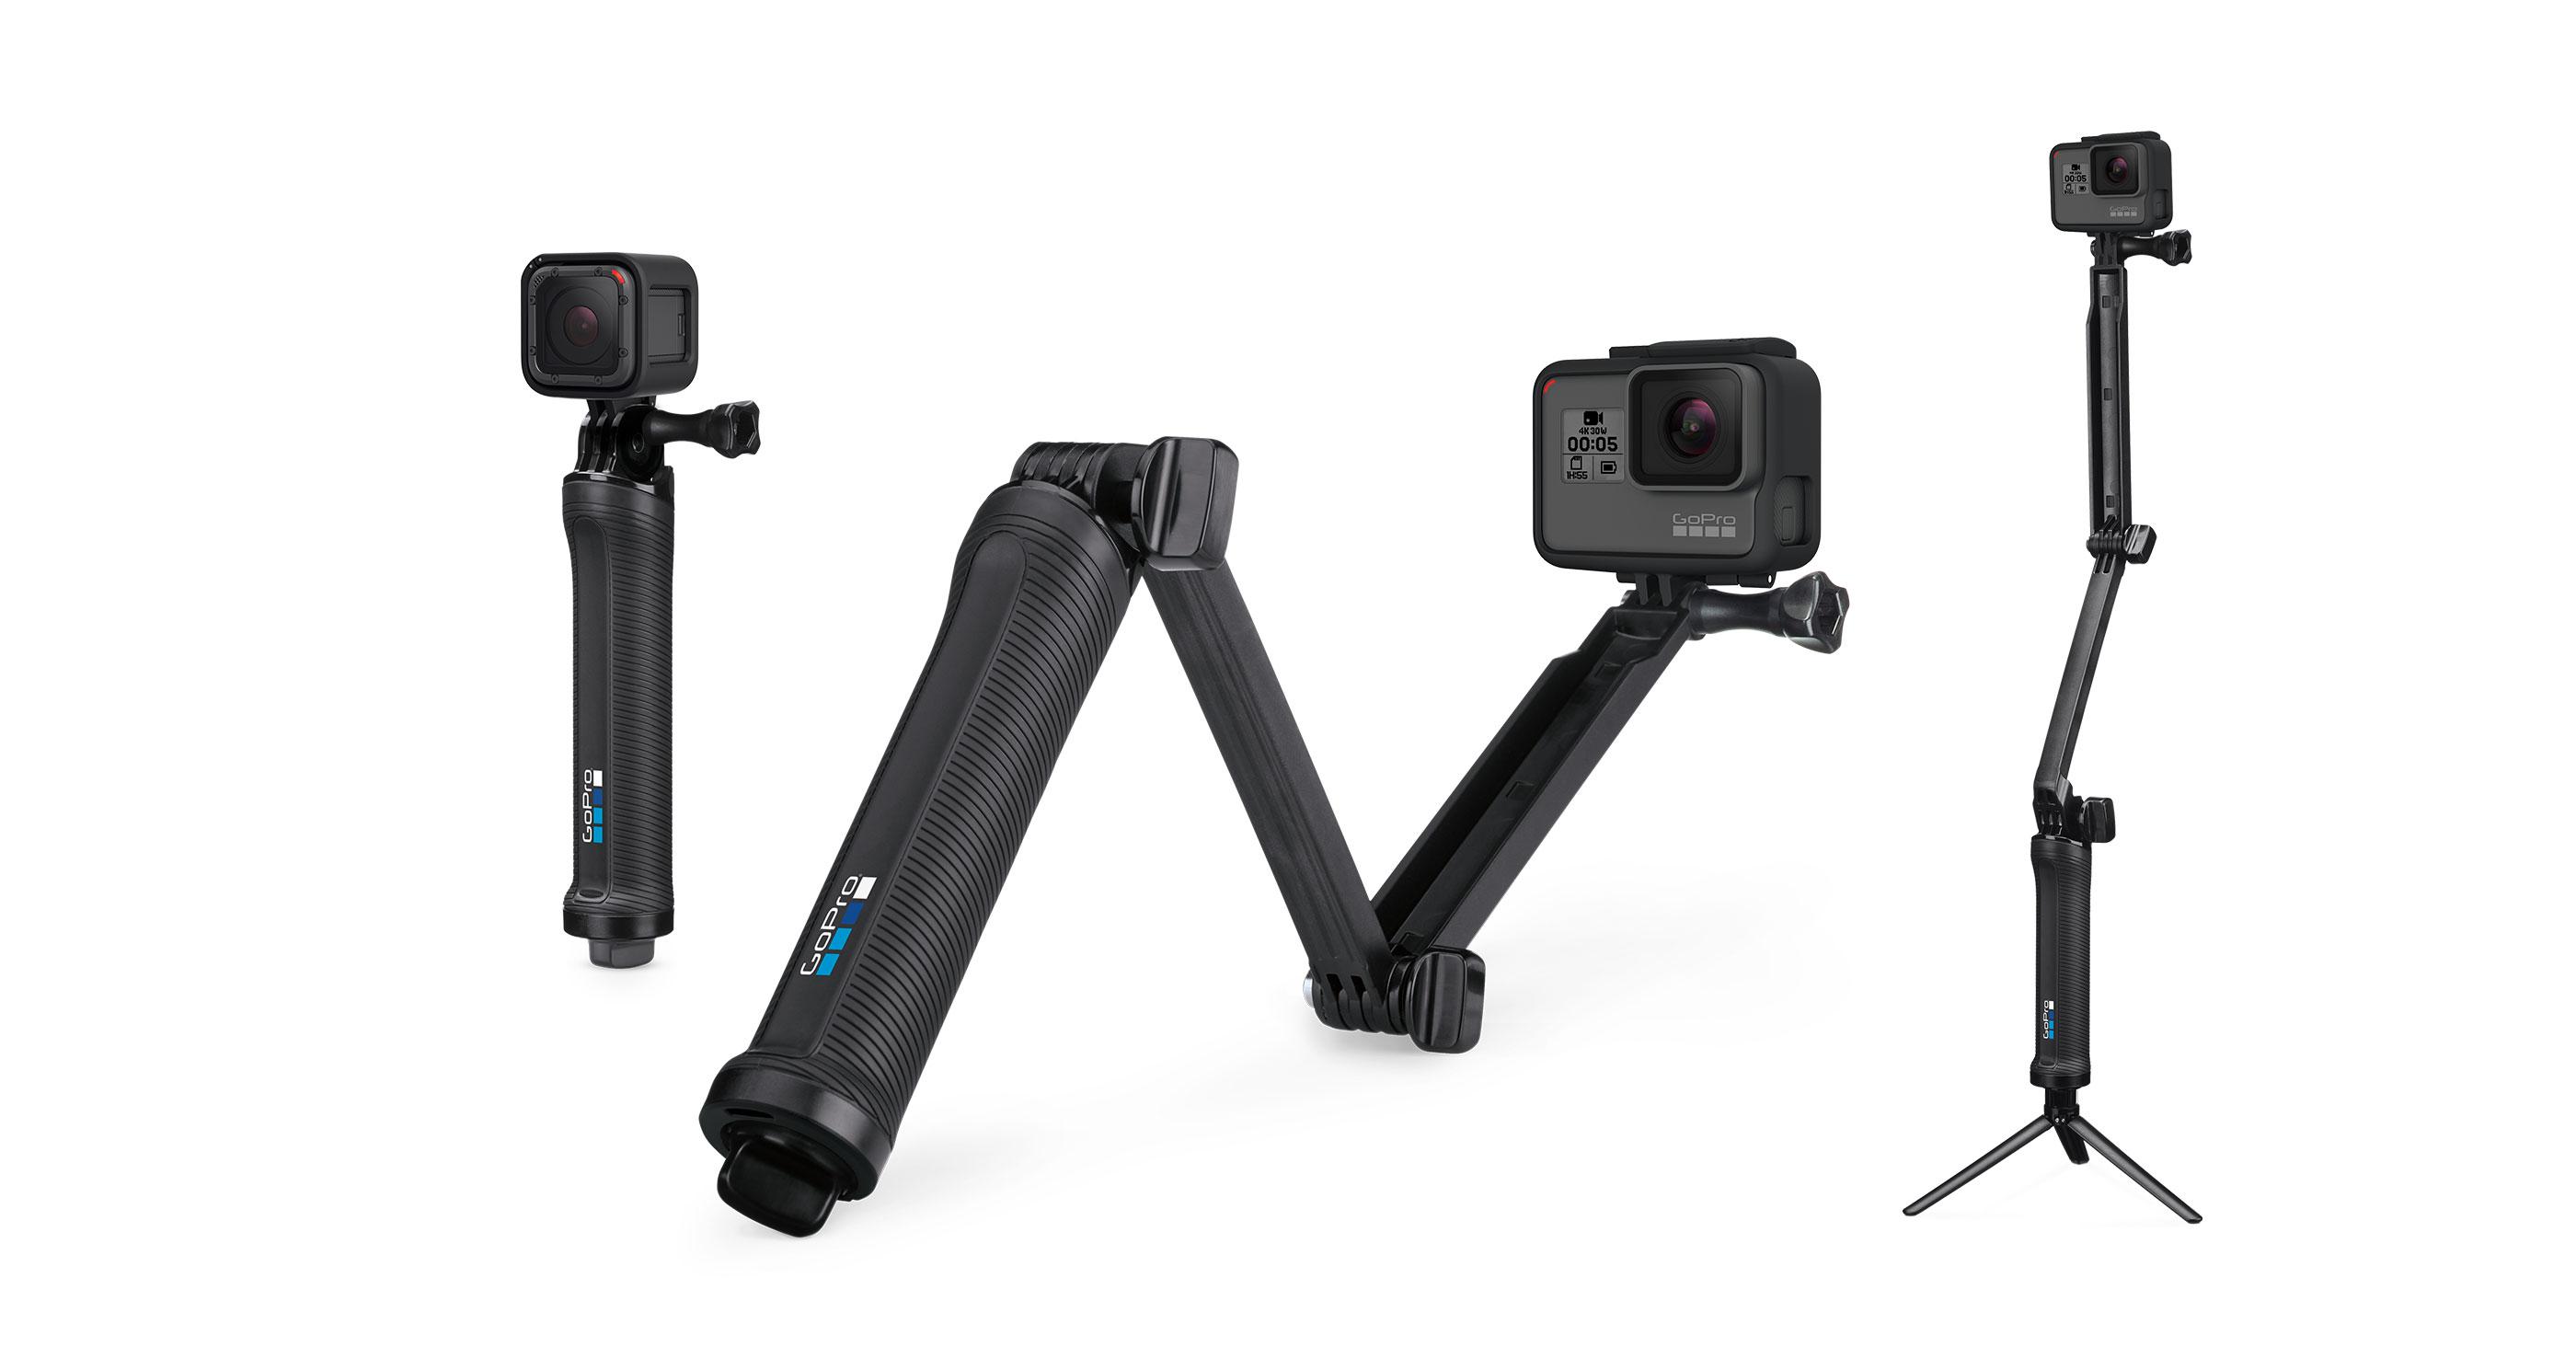 Sistem de prindere GoPro 3-Way AFAEM-001